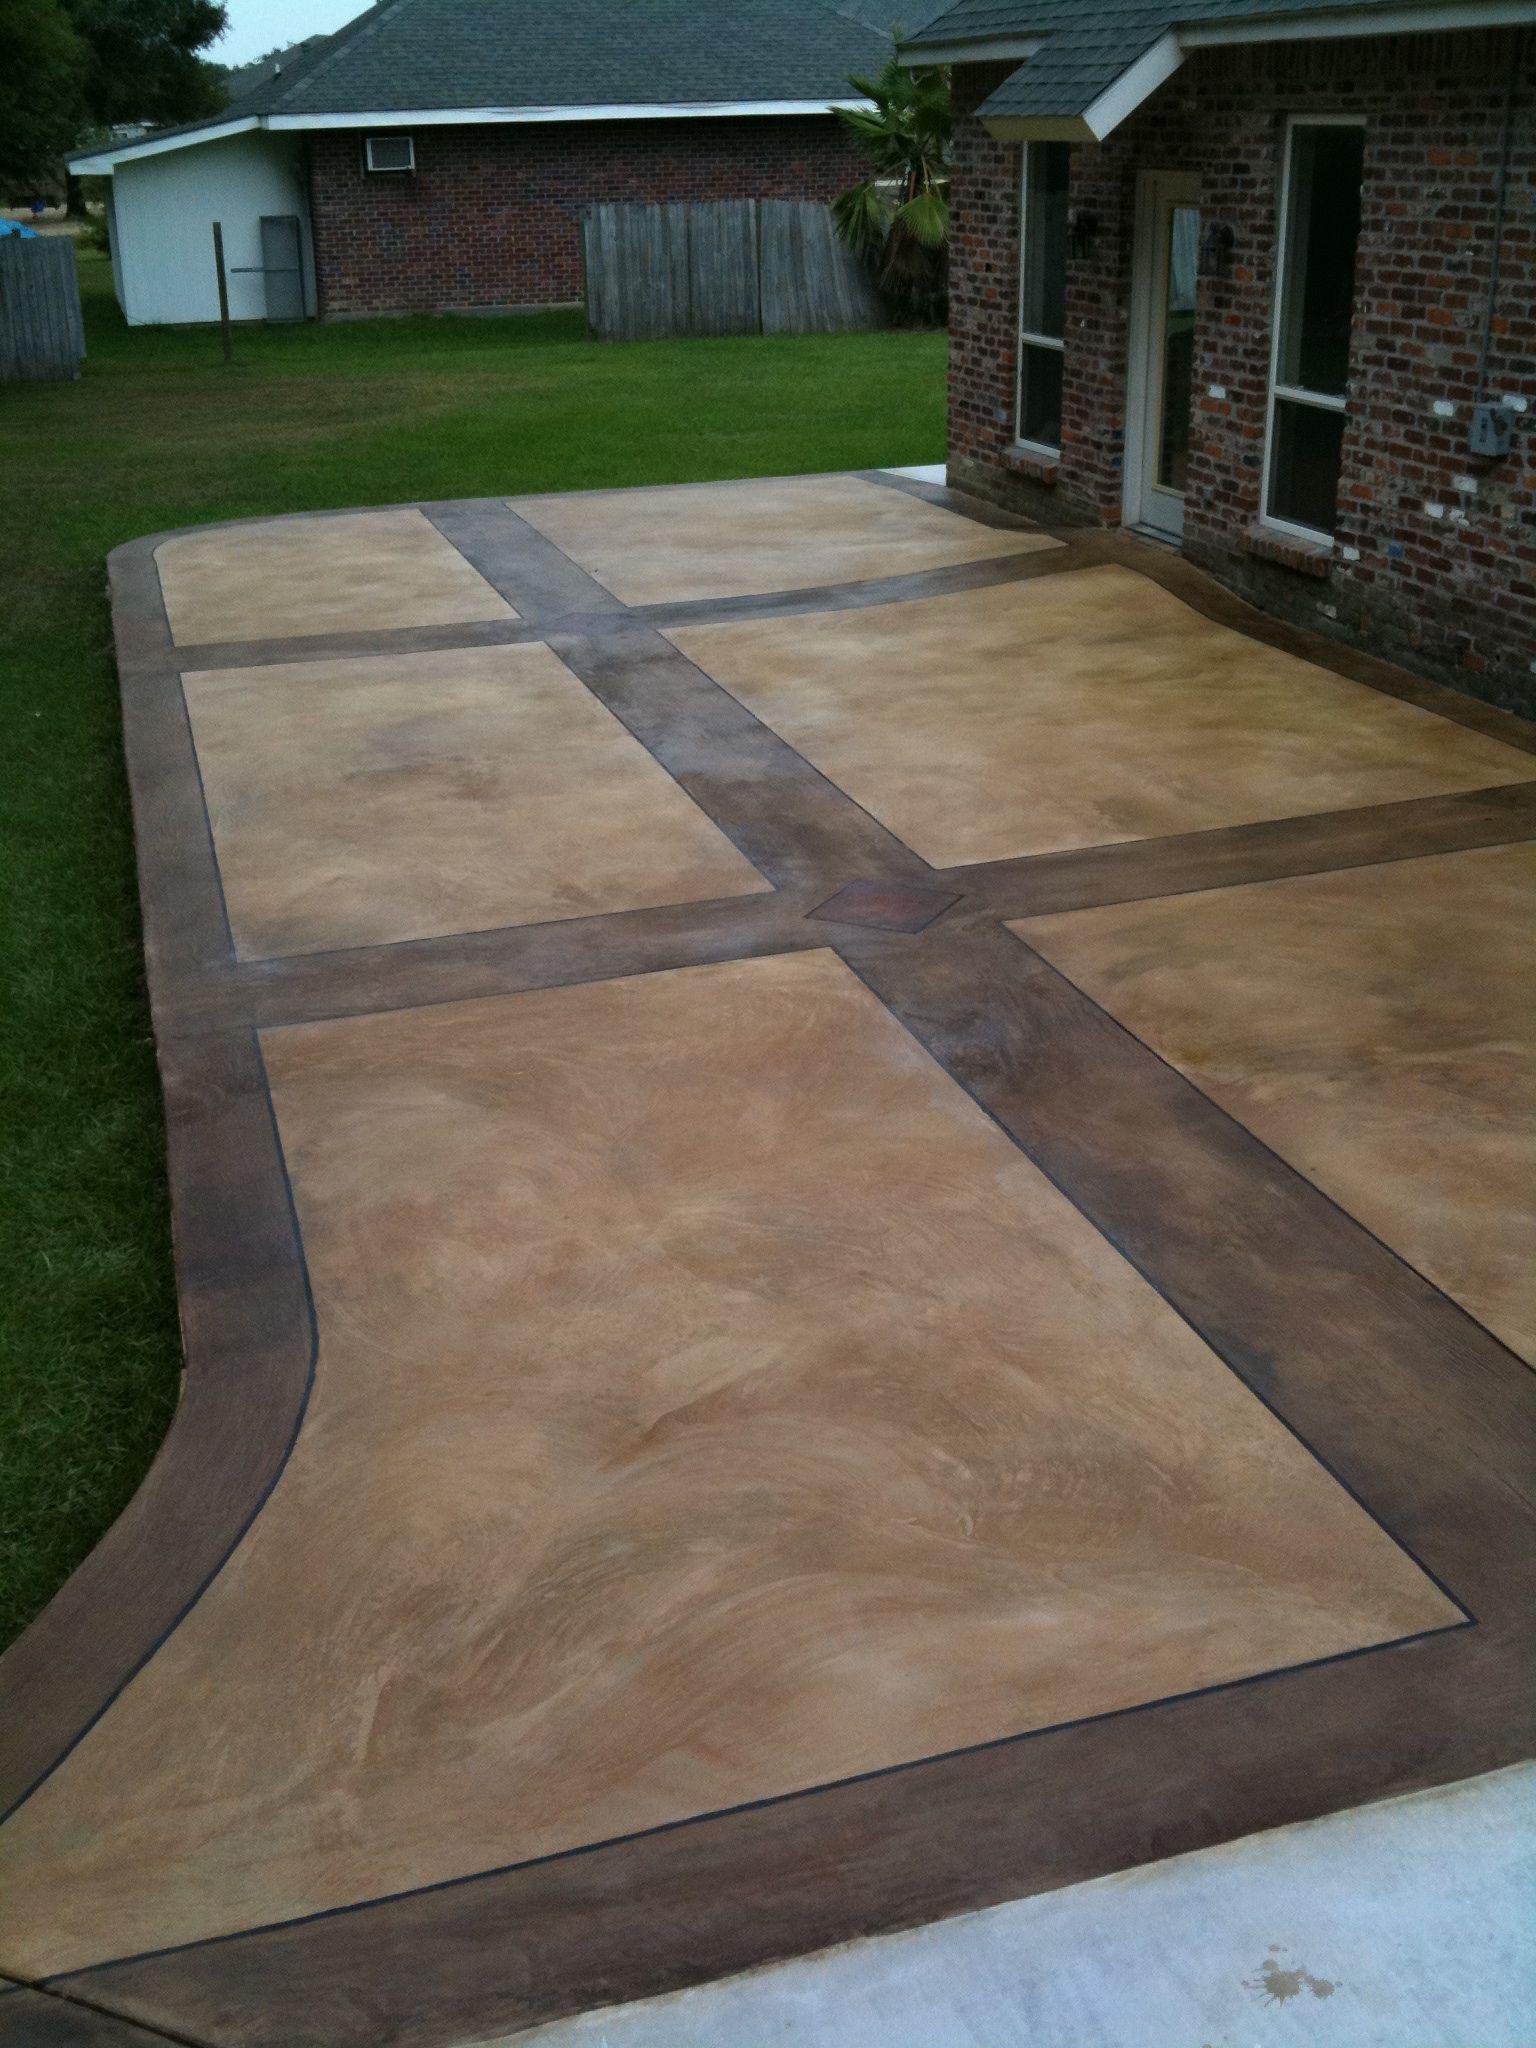 Decorative Concrete Overlay, Outdoor Patio Concrete Overlay